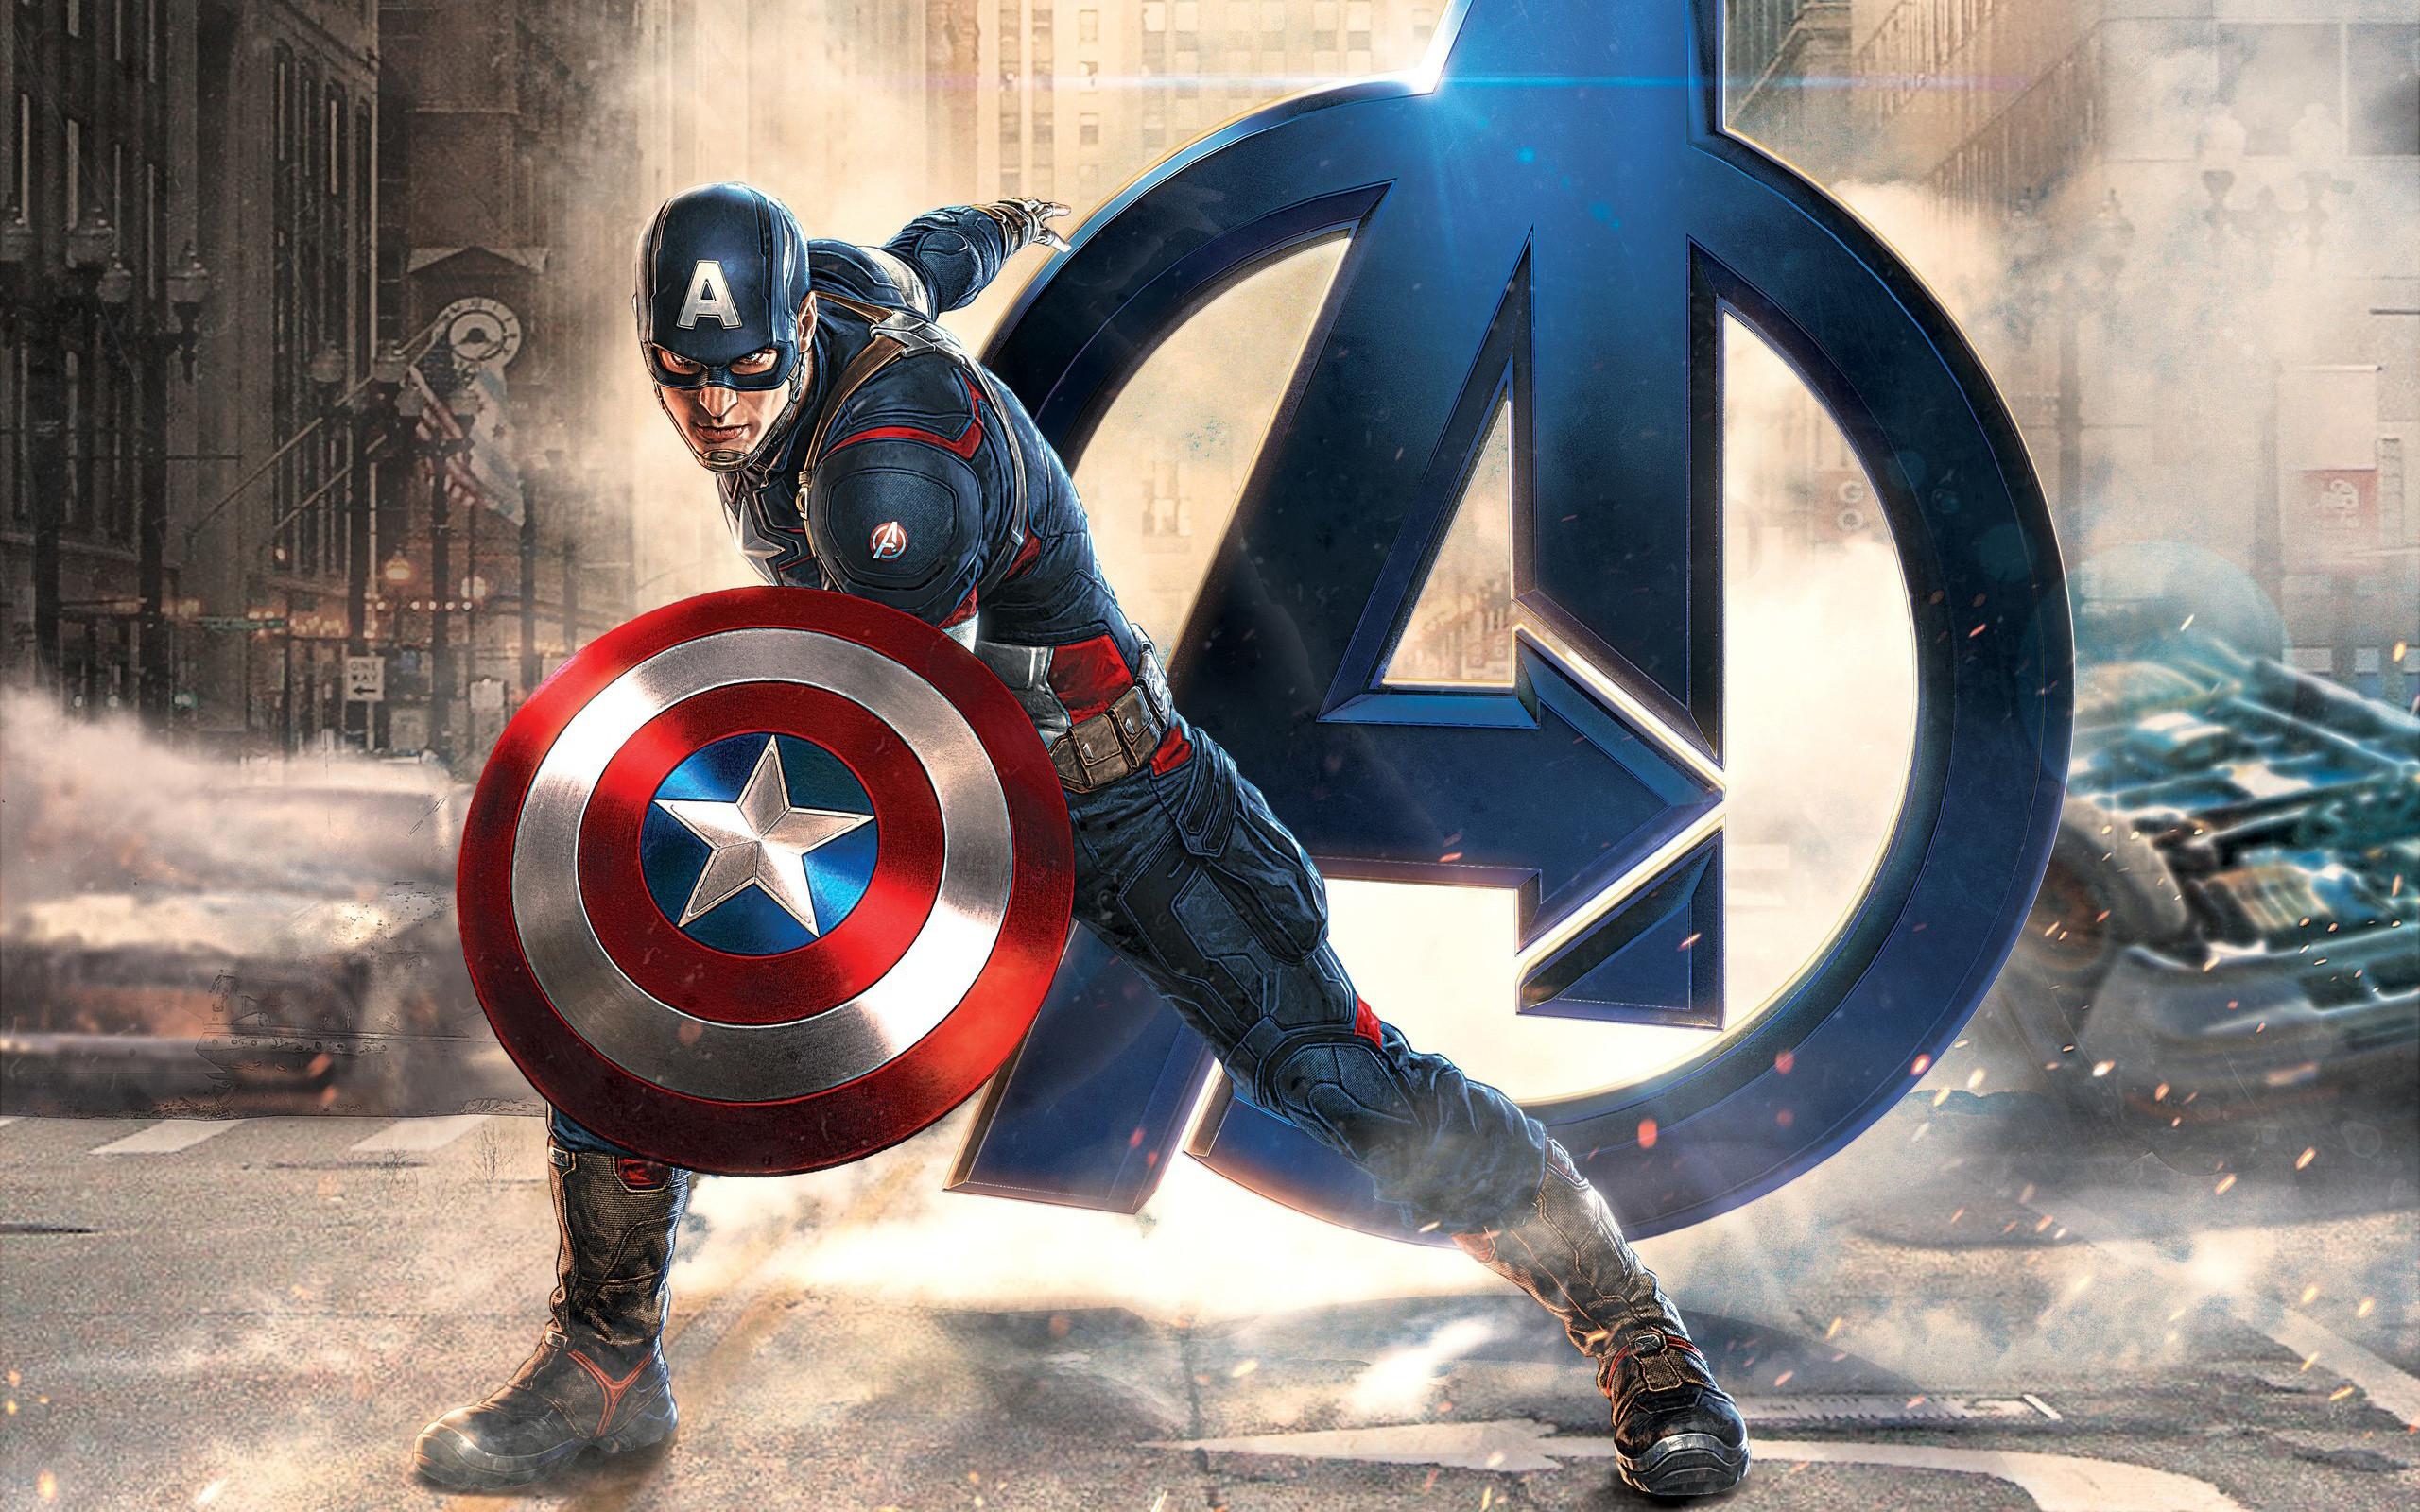 Captain America Avengers HD Wallpaper | HD Wallpapers Pal